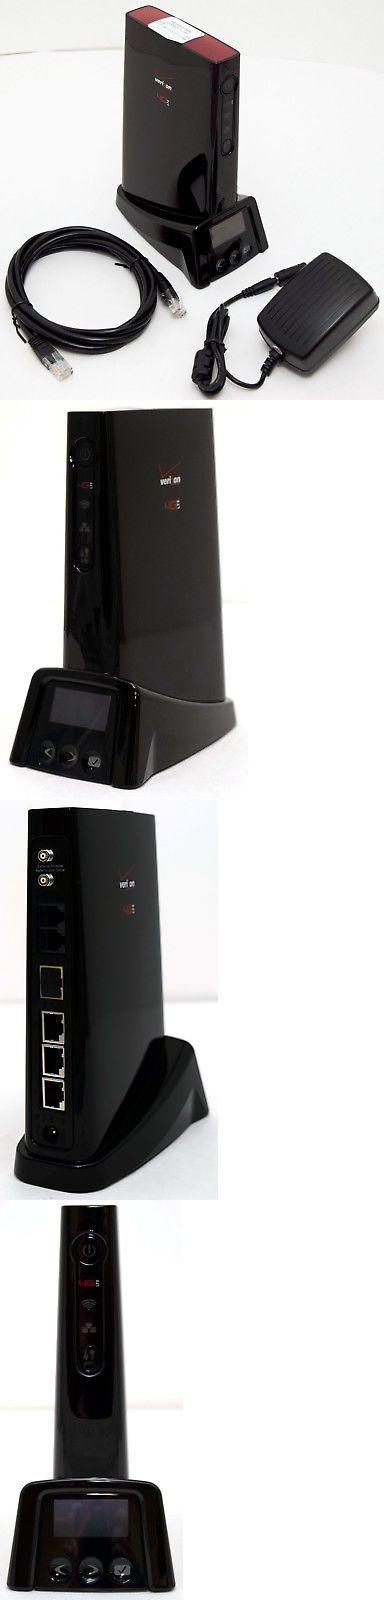 Novatel T1114 Tasman VERIZON 4G LTE Broadband Router Voice internet data